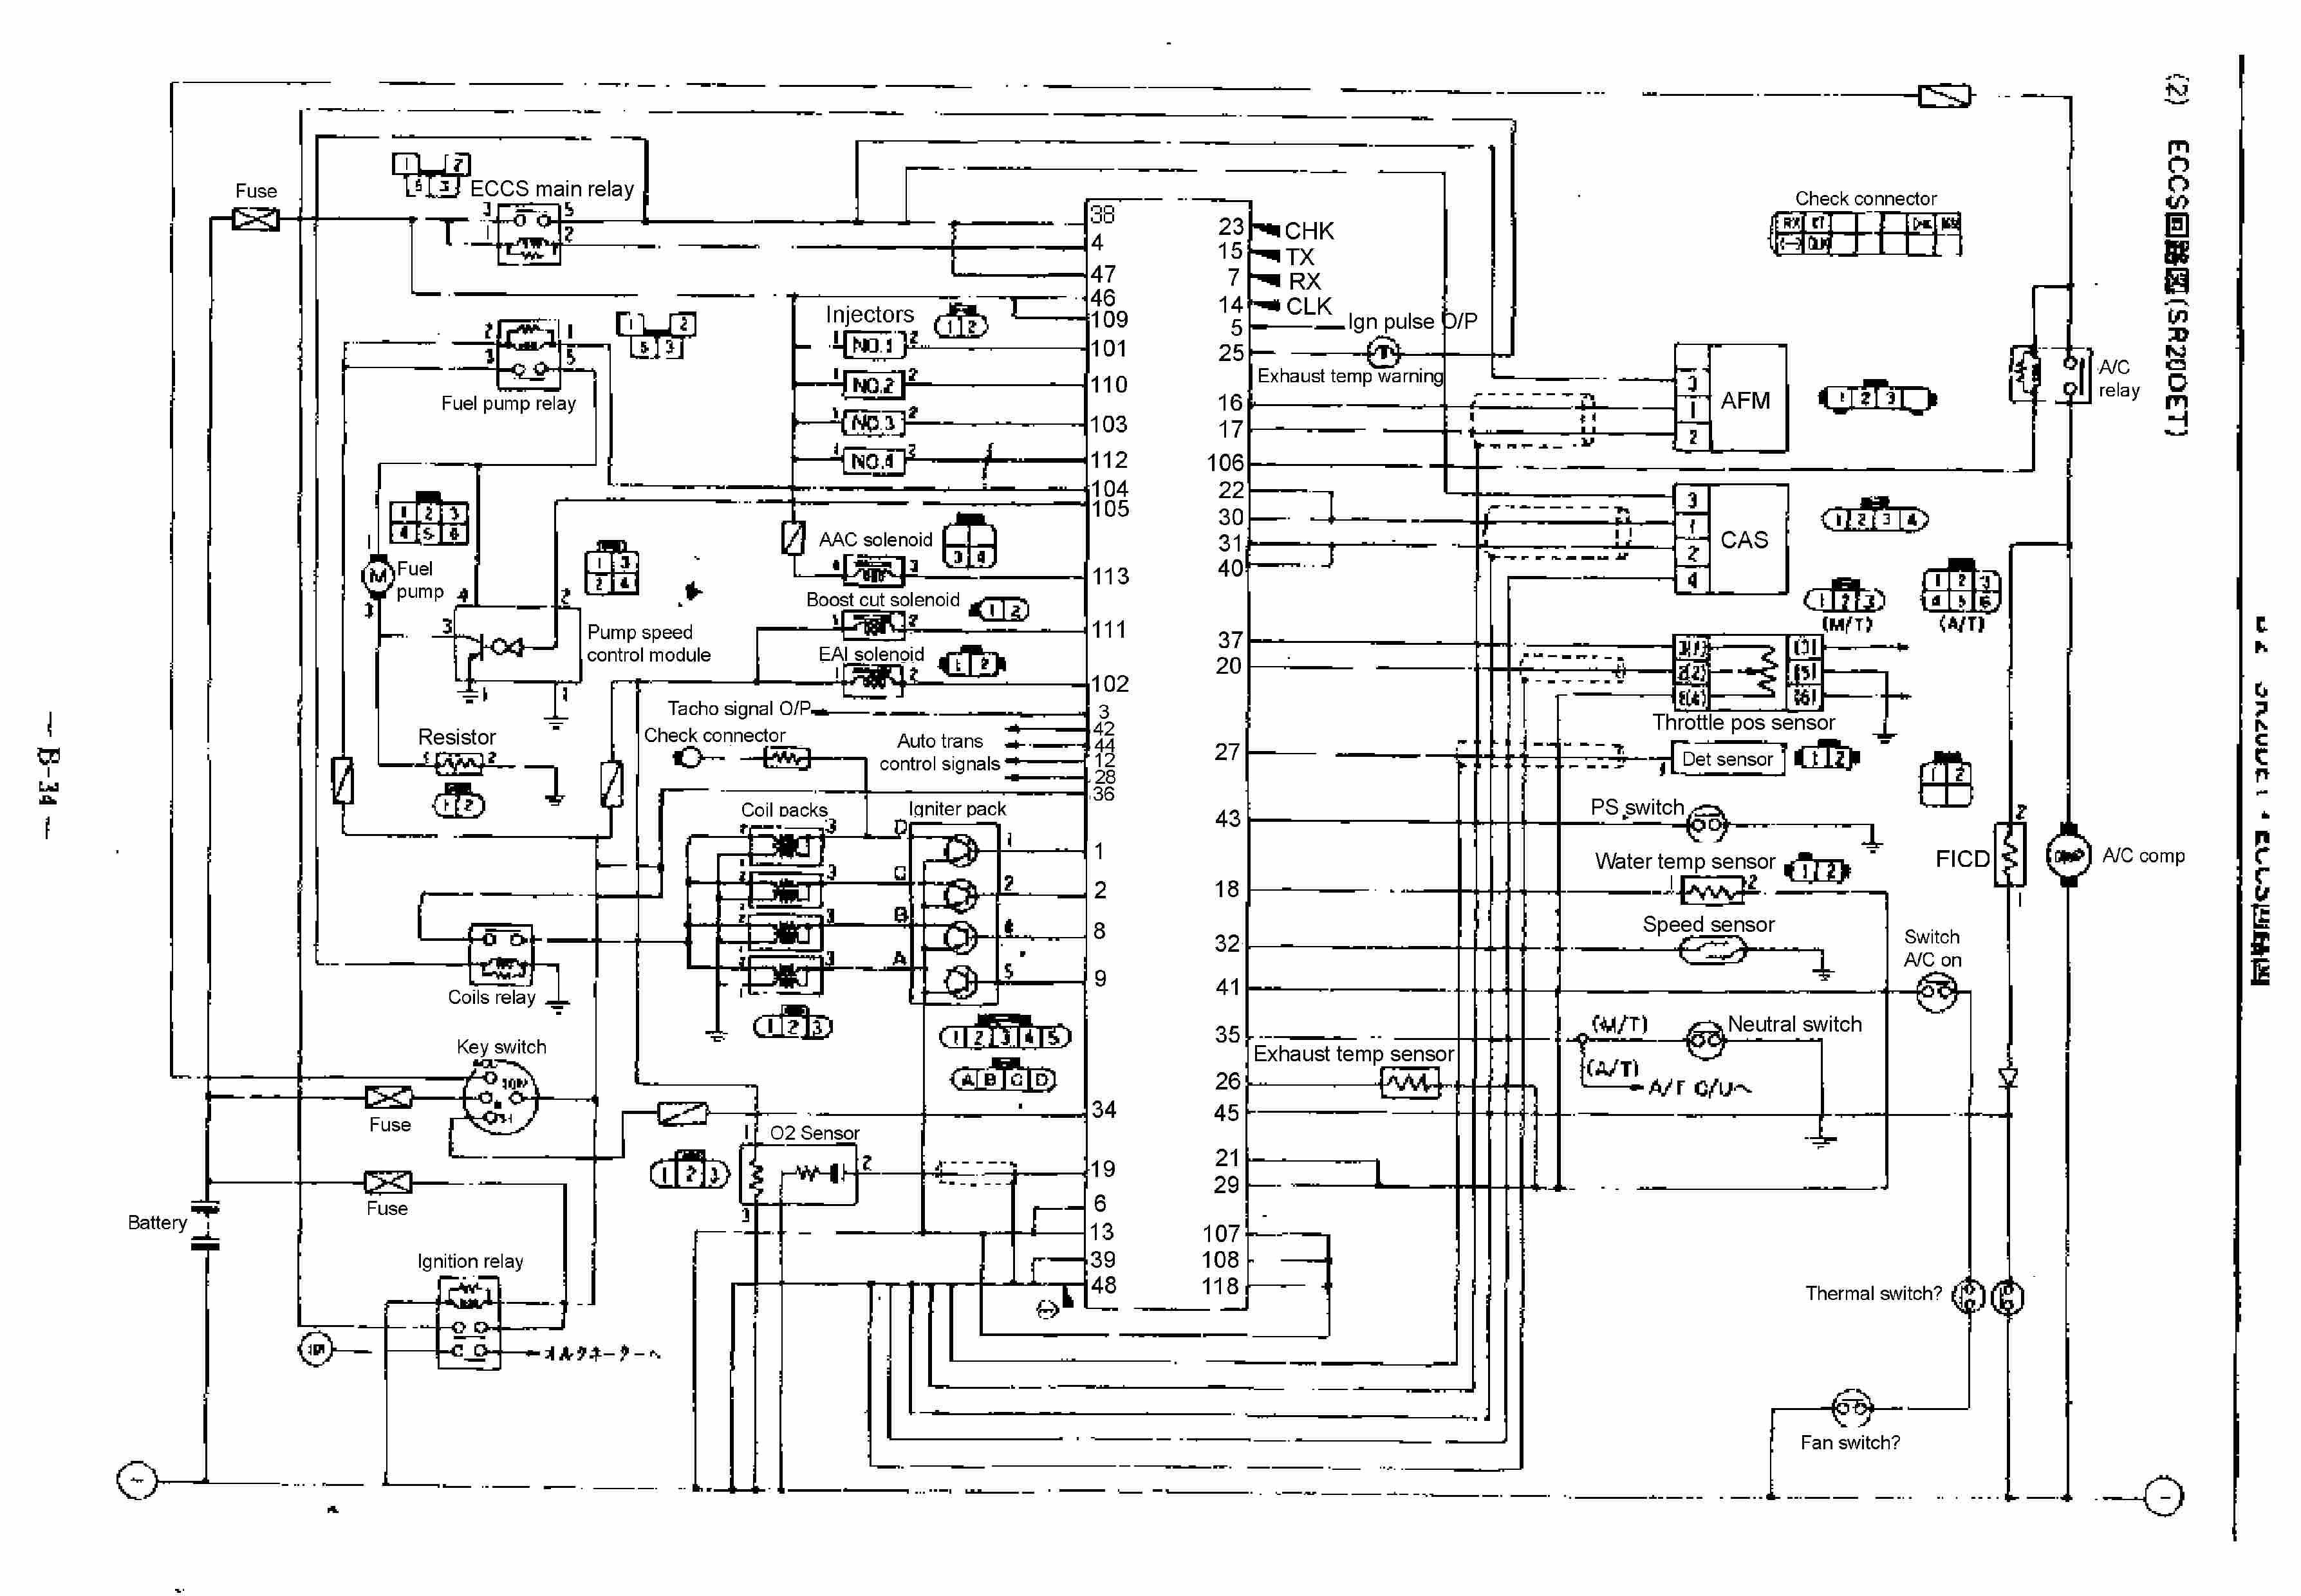 wireing diagram for 2008 chevy trailblazer